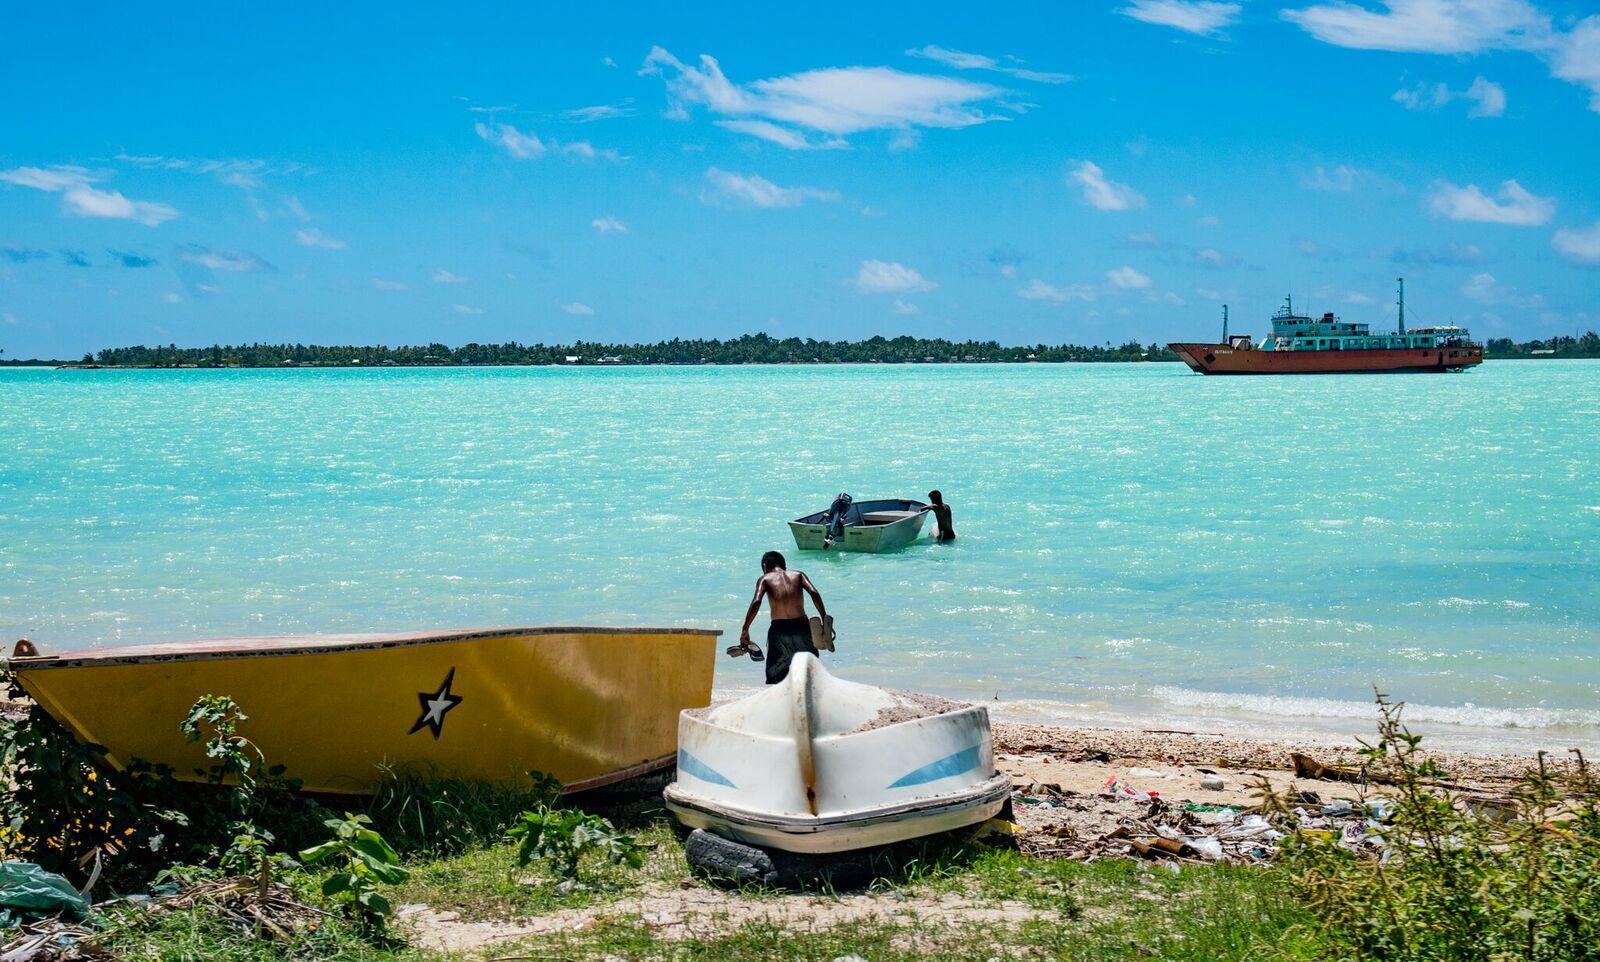 Despite rising seas, Kiribati's president plans development